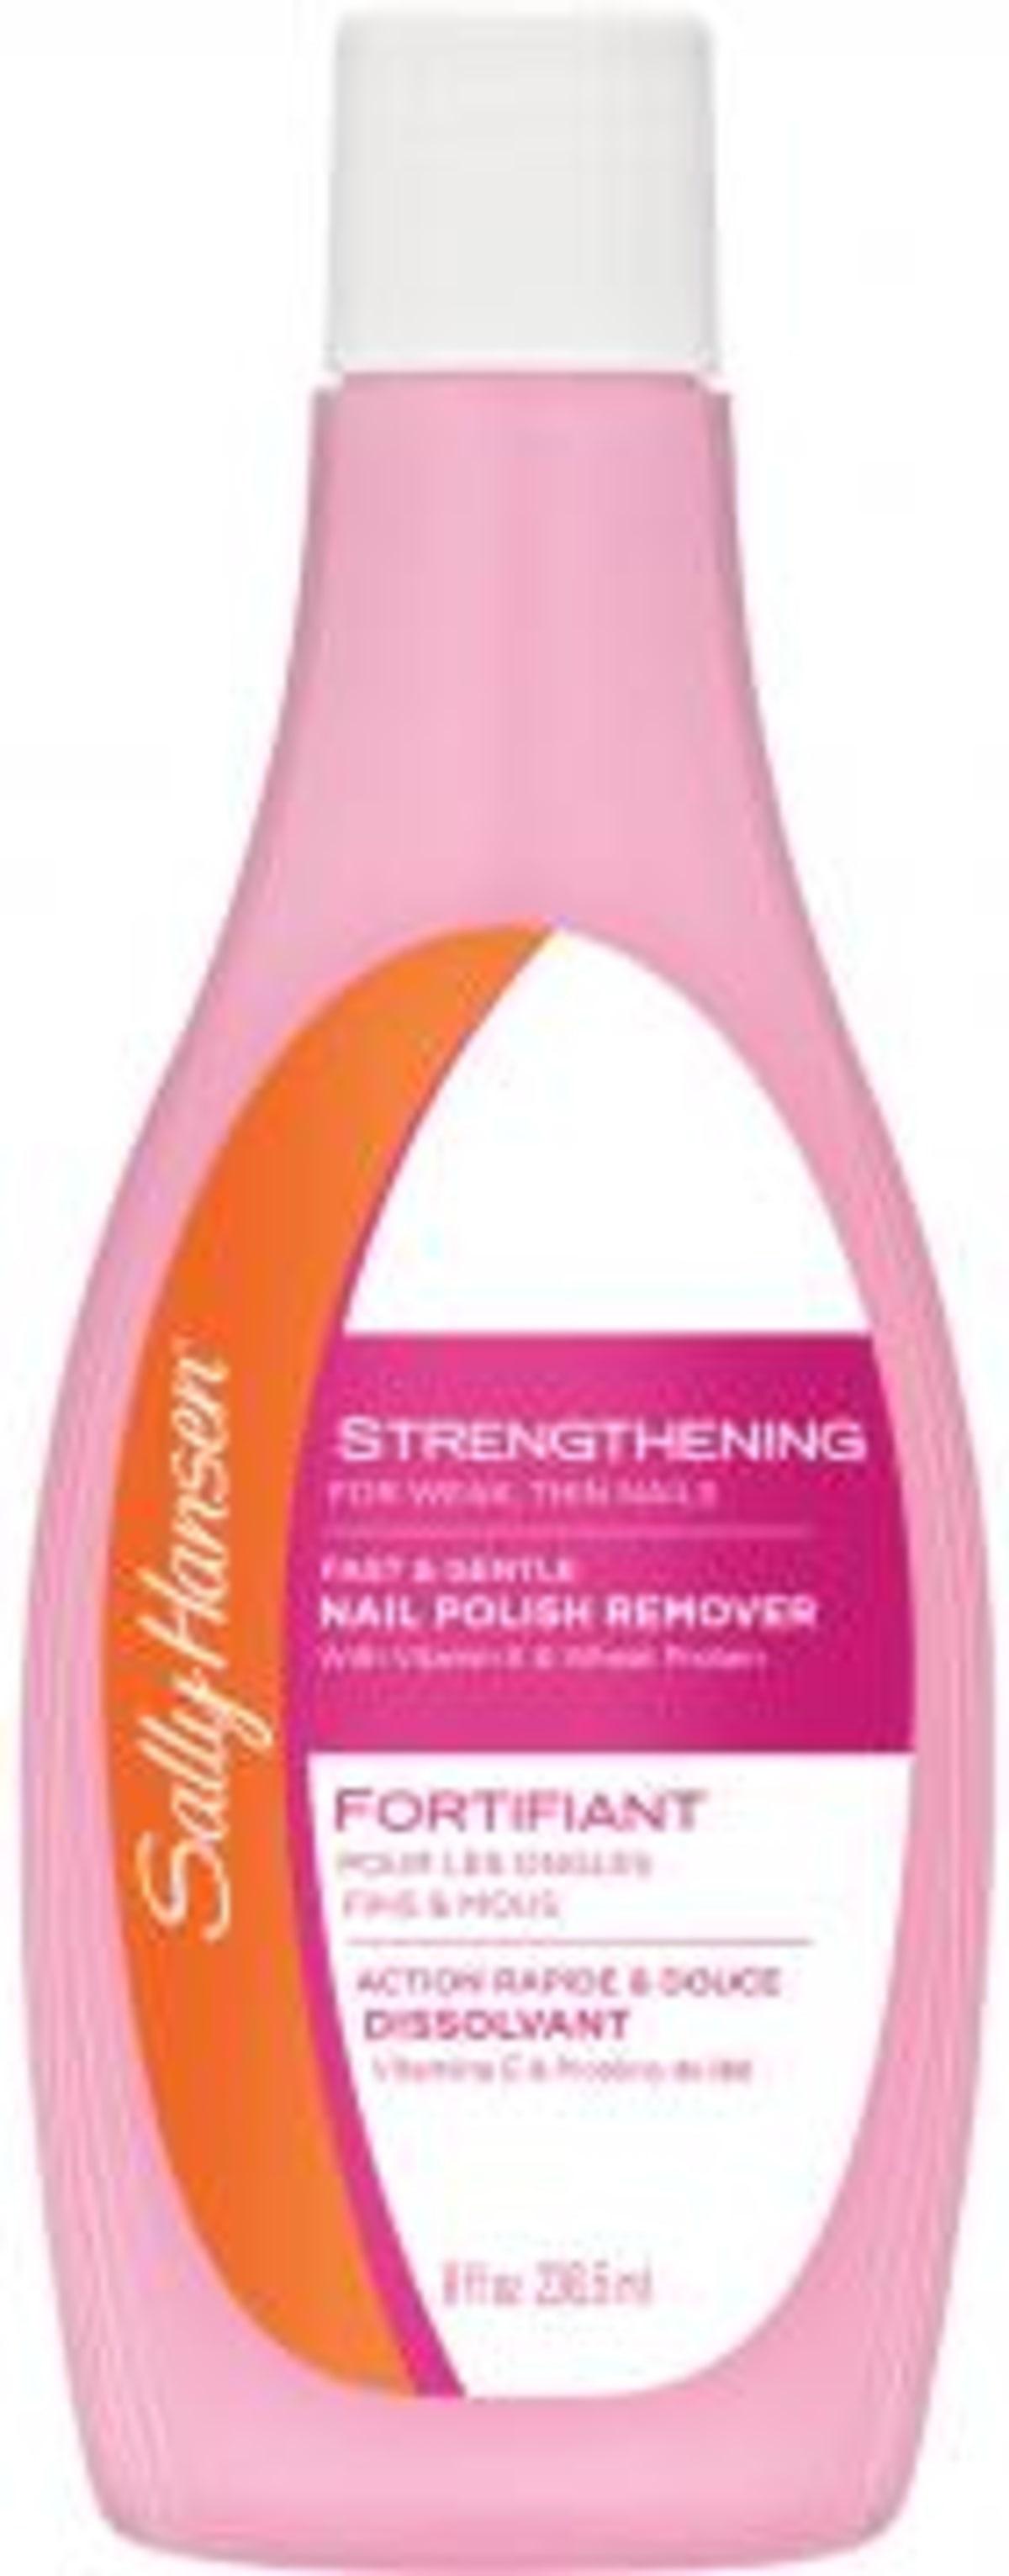 Sally Hansen® Strengthening Nail Polish Remover